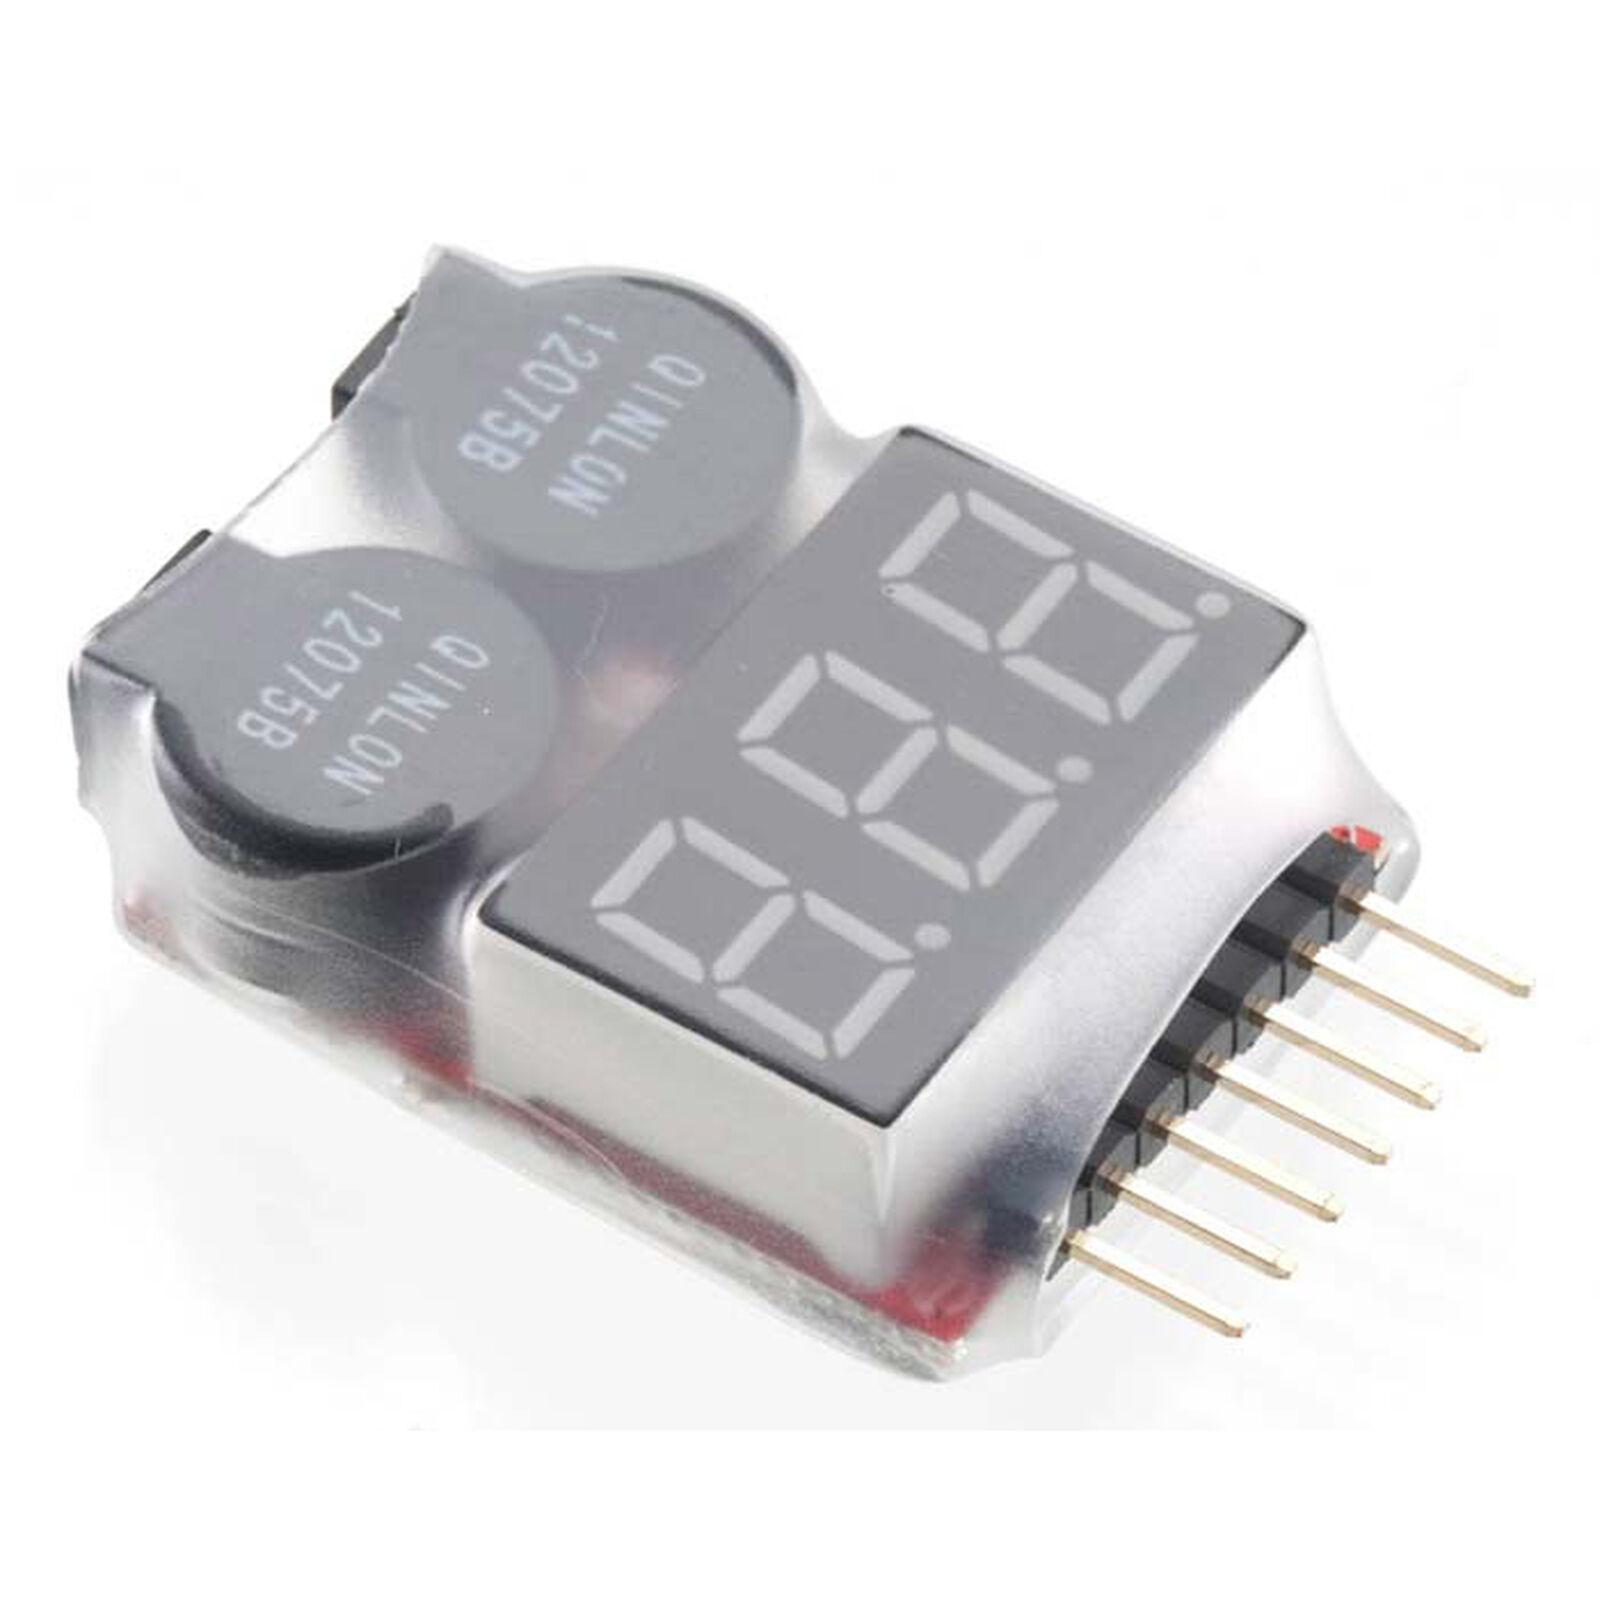 LiPo Voltage Checker/Warning Alarm